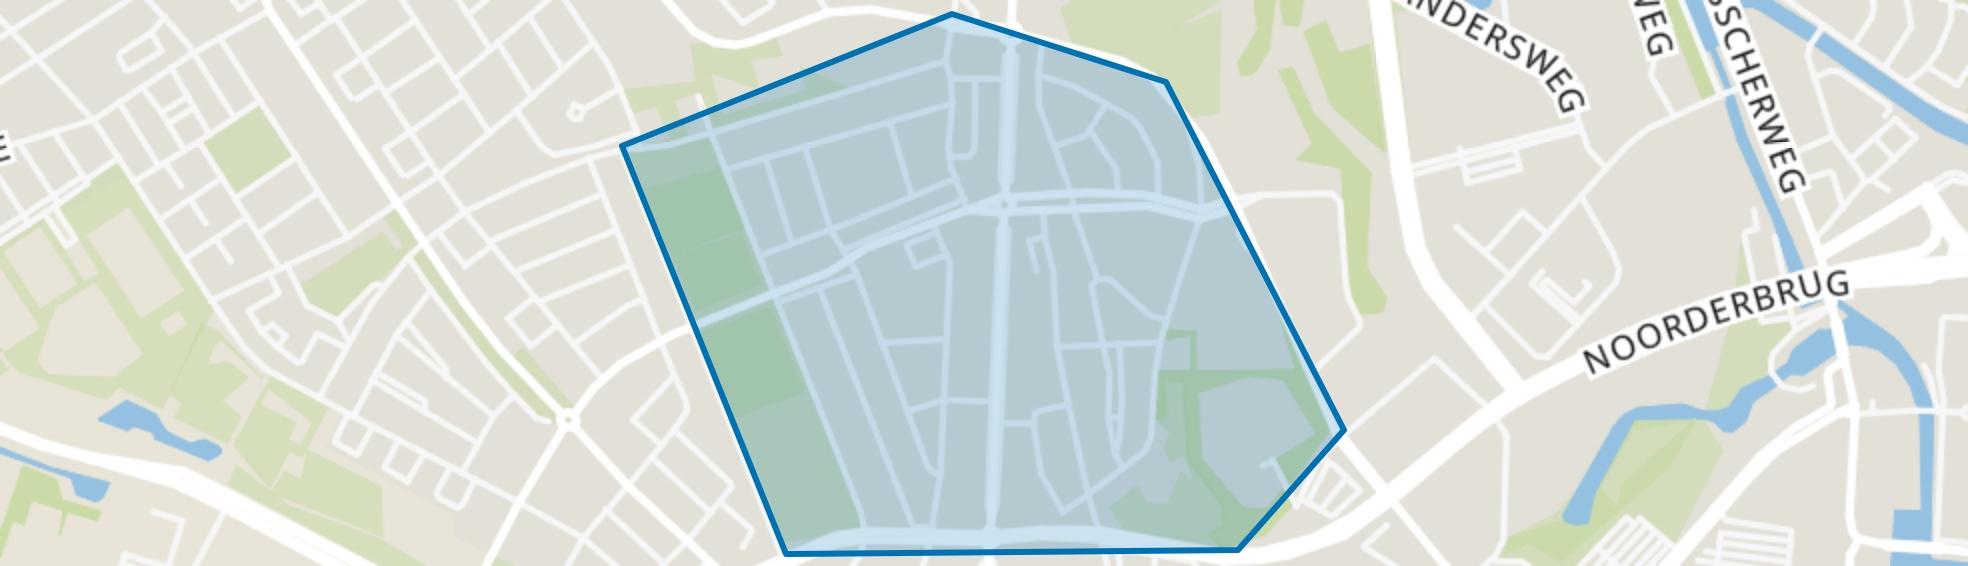 Caberg, Maastricht map